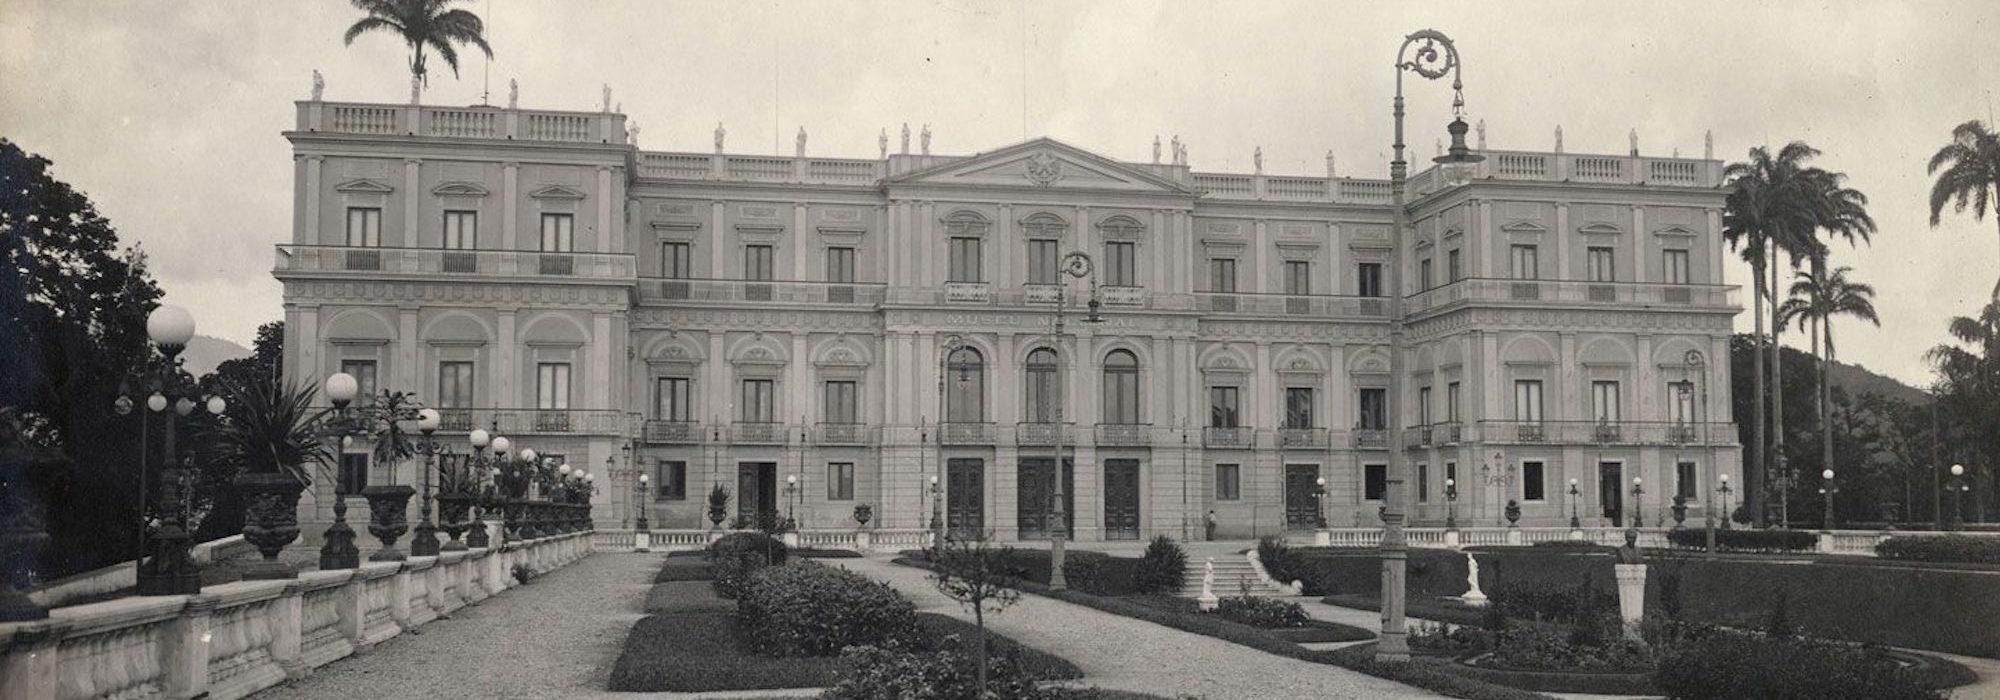 Imagem: Instituto Moreira Salles (Anos 1930)